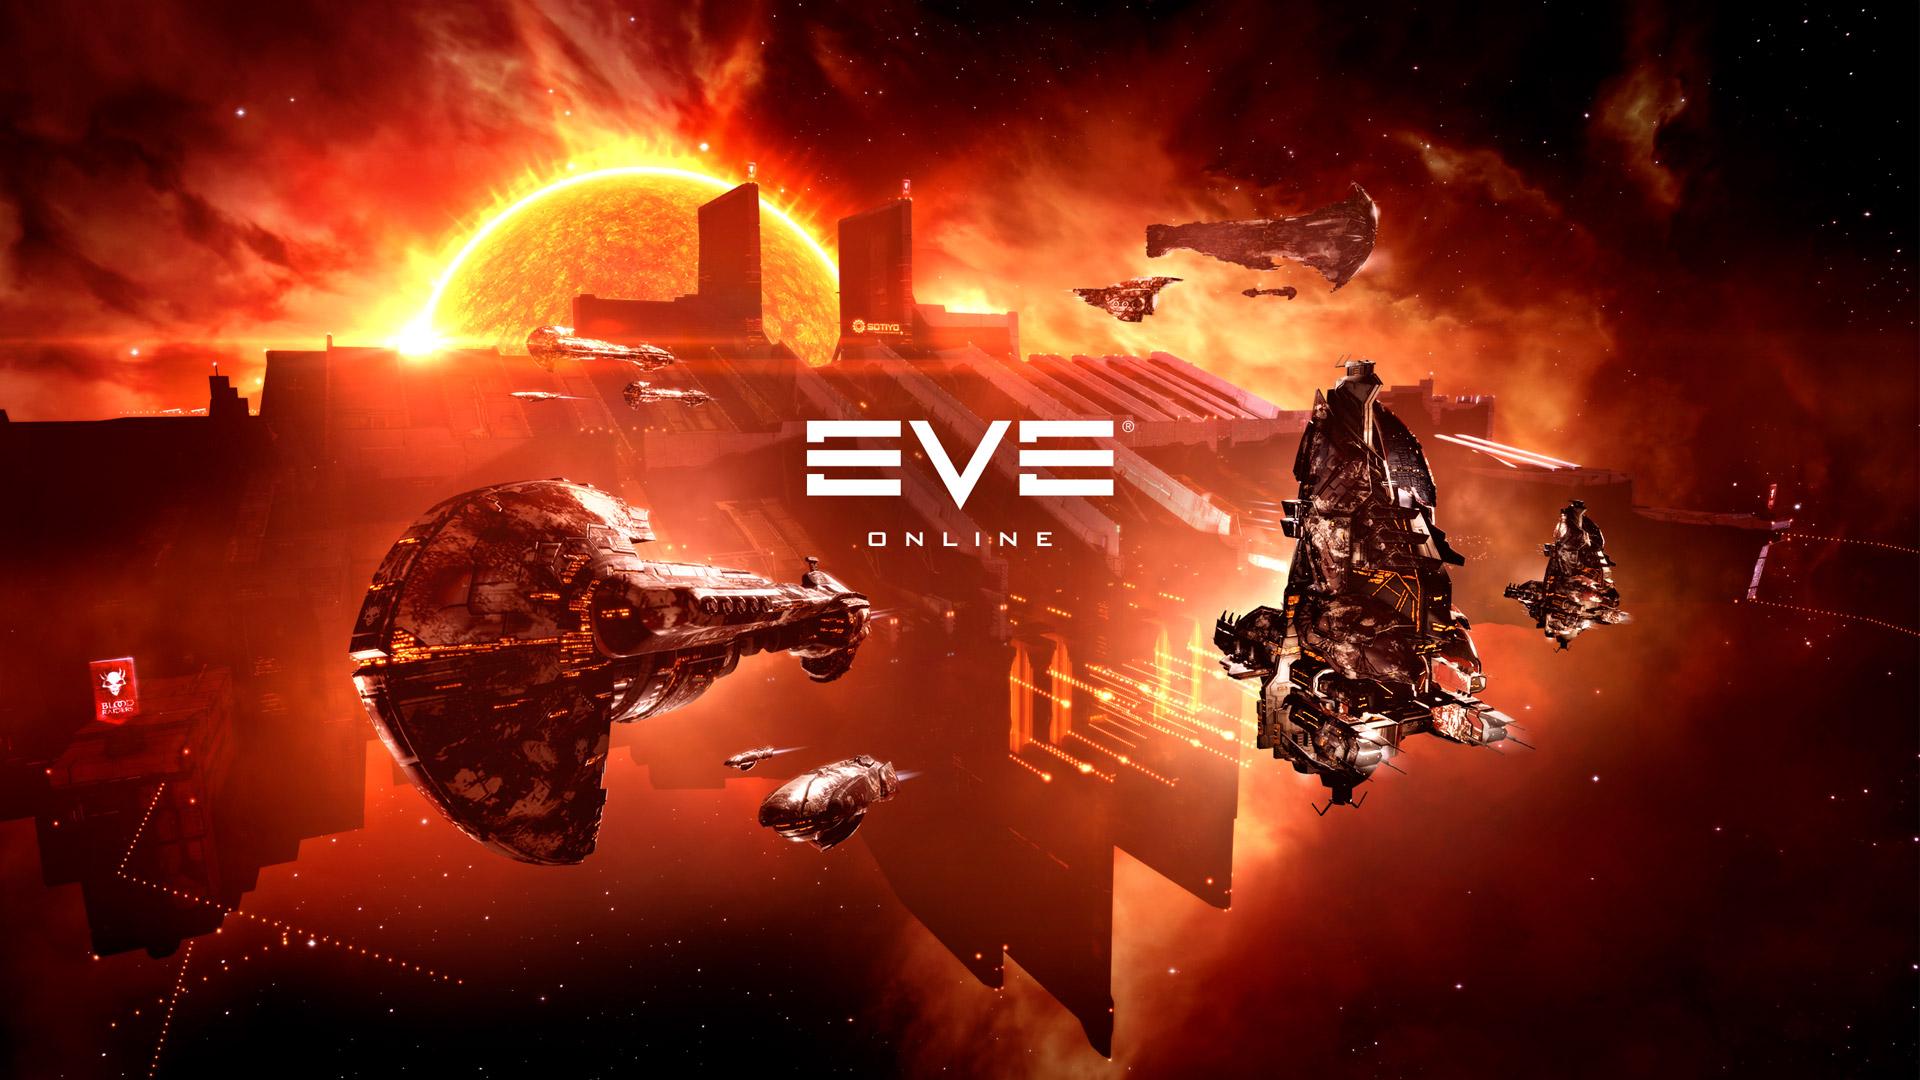 Free EVE Online Wallpaper in 1920x1080